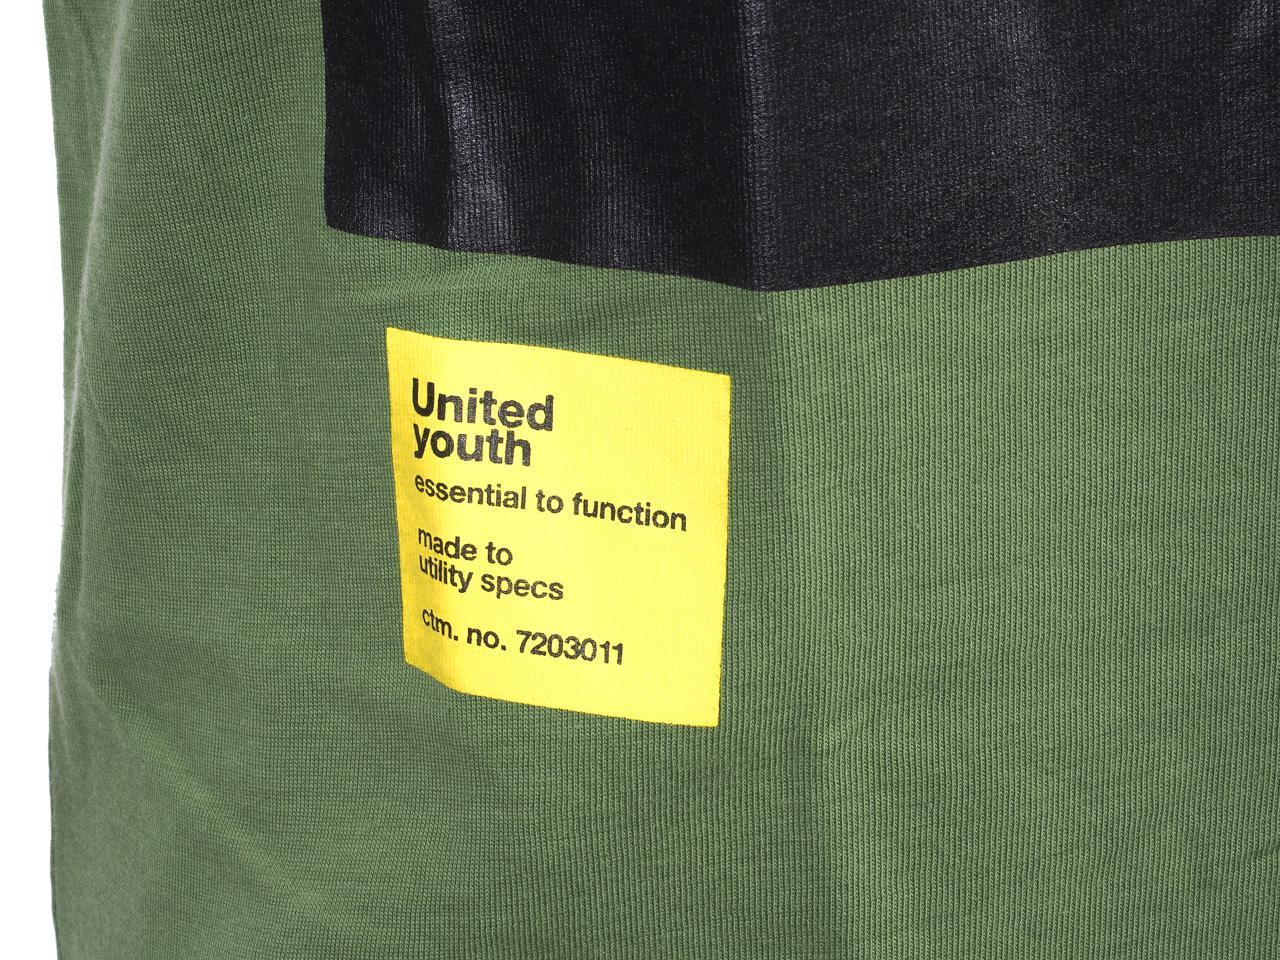 Short-Sleeve-T-Shirt-Jack-and-Jones-Dave-Vineyard-Green-Tee-44186-Does-Not thumbnail 3